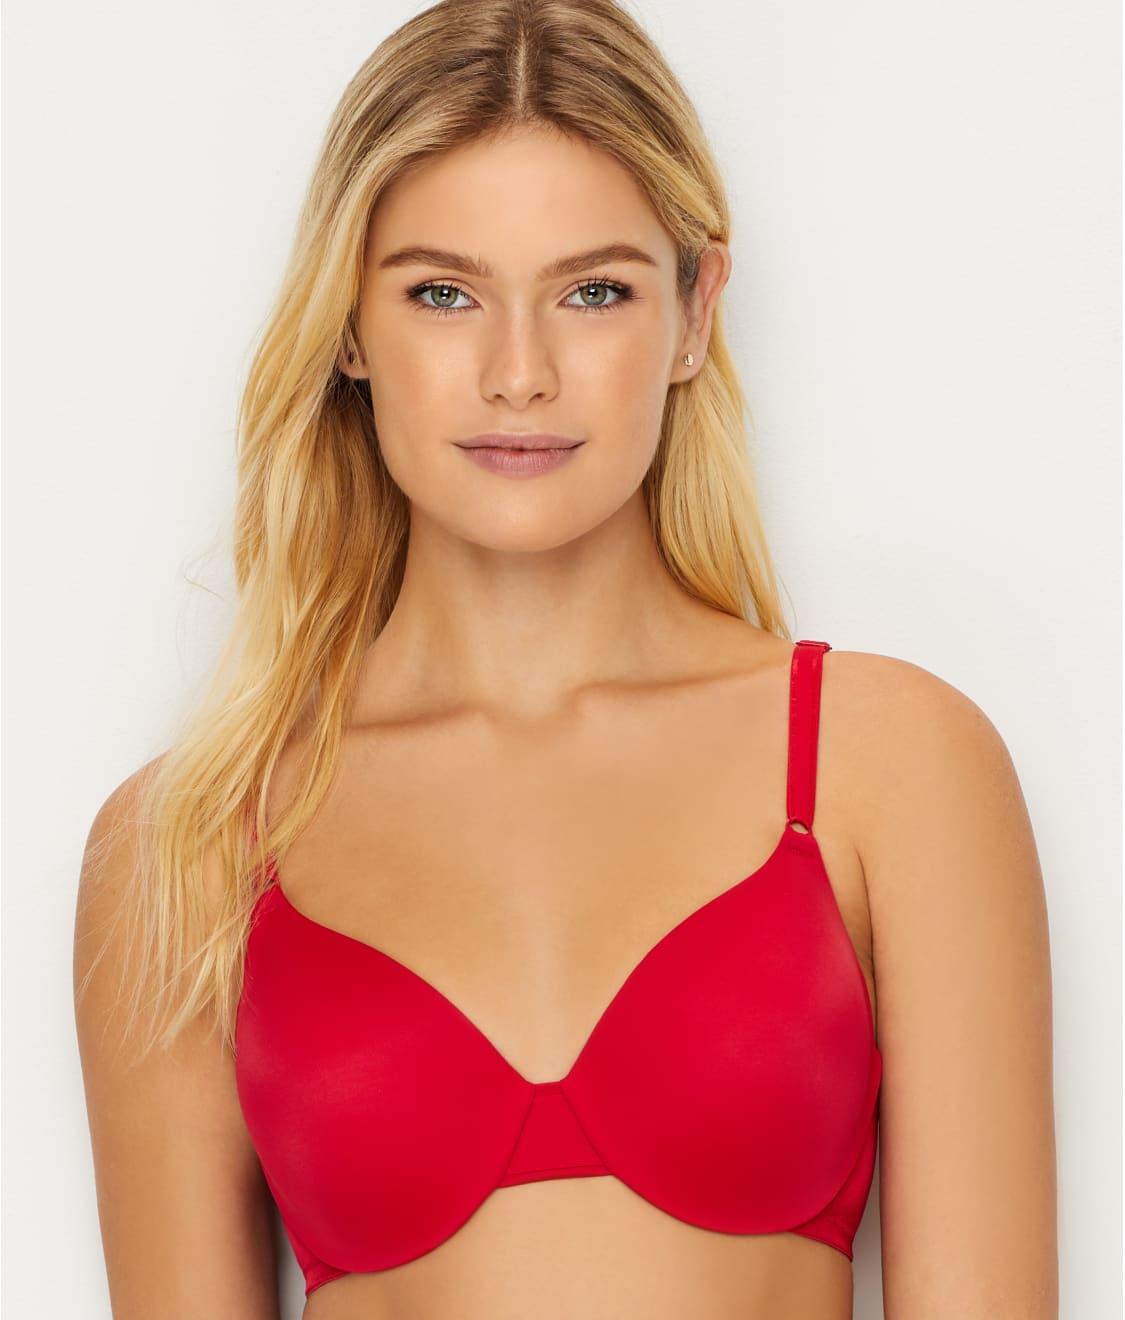 e22c7a321a6 See This Is Not A Bra T-Shirt Bra in Crimson